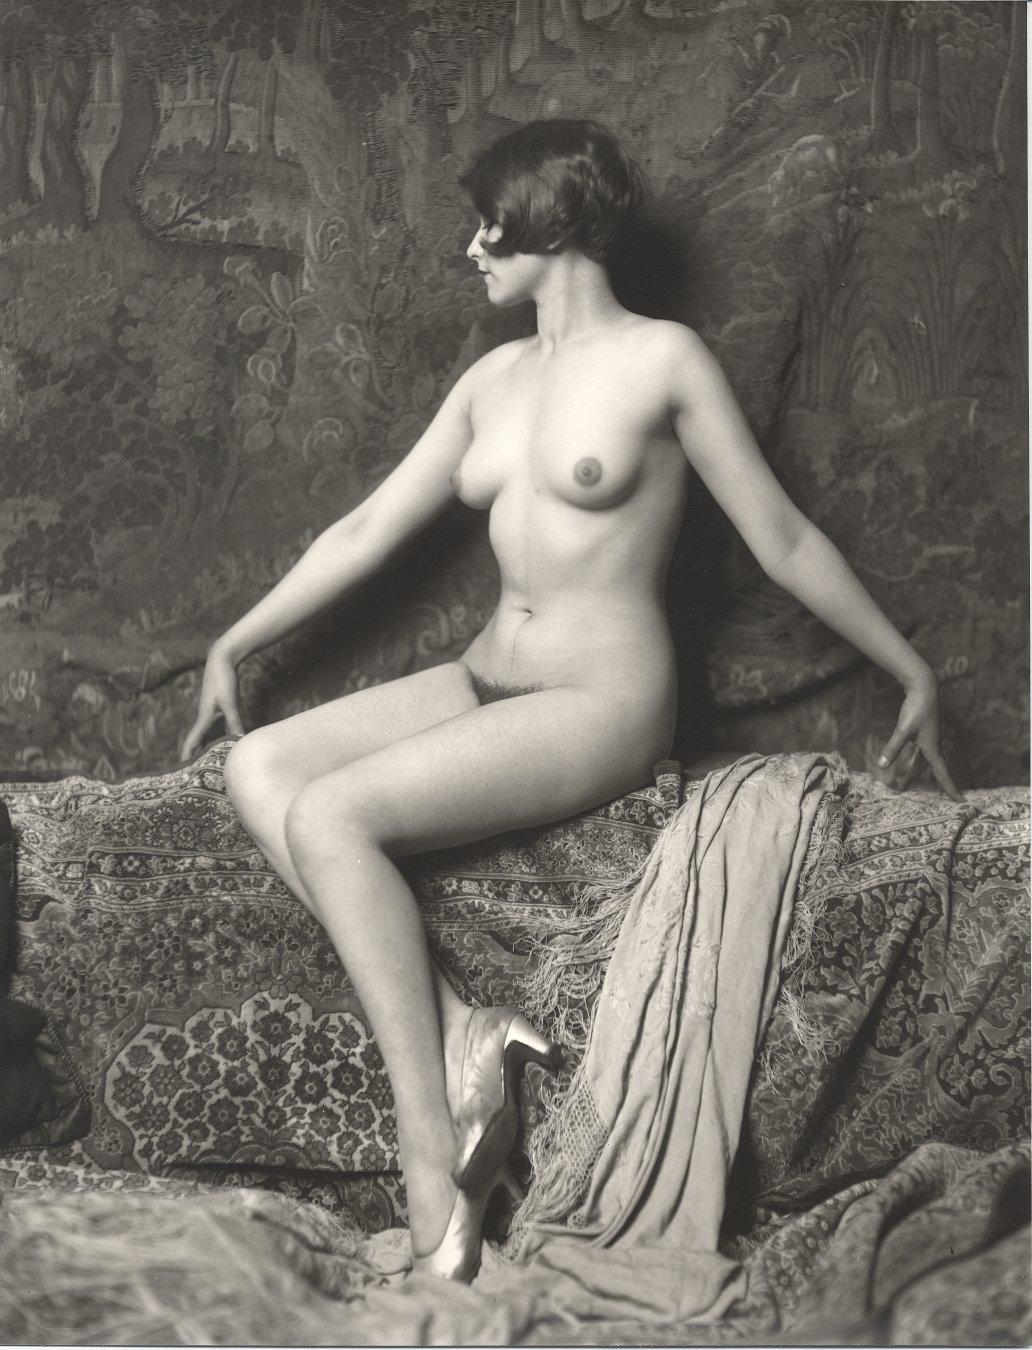 Girl nude vintage 1920 3gp adult videos